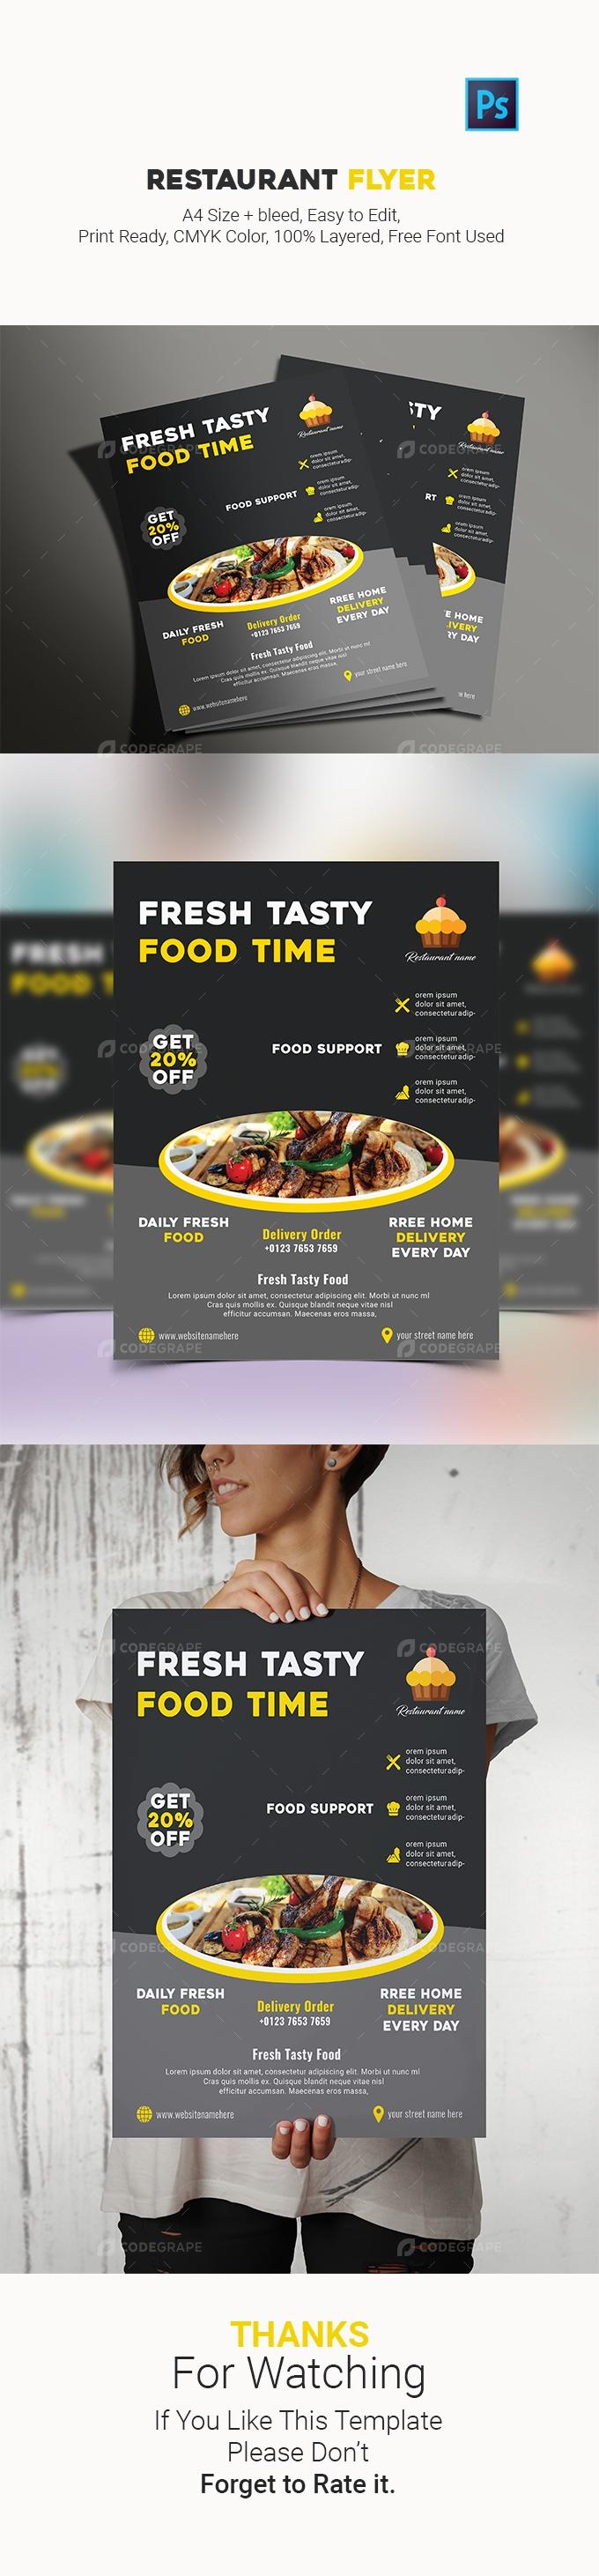 Restaurant flyre design template